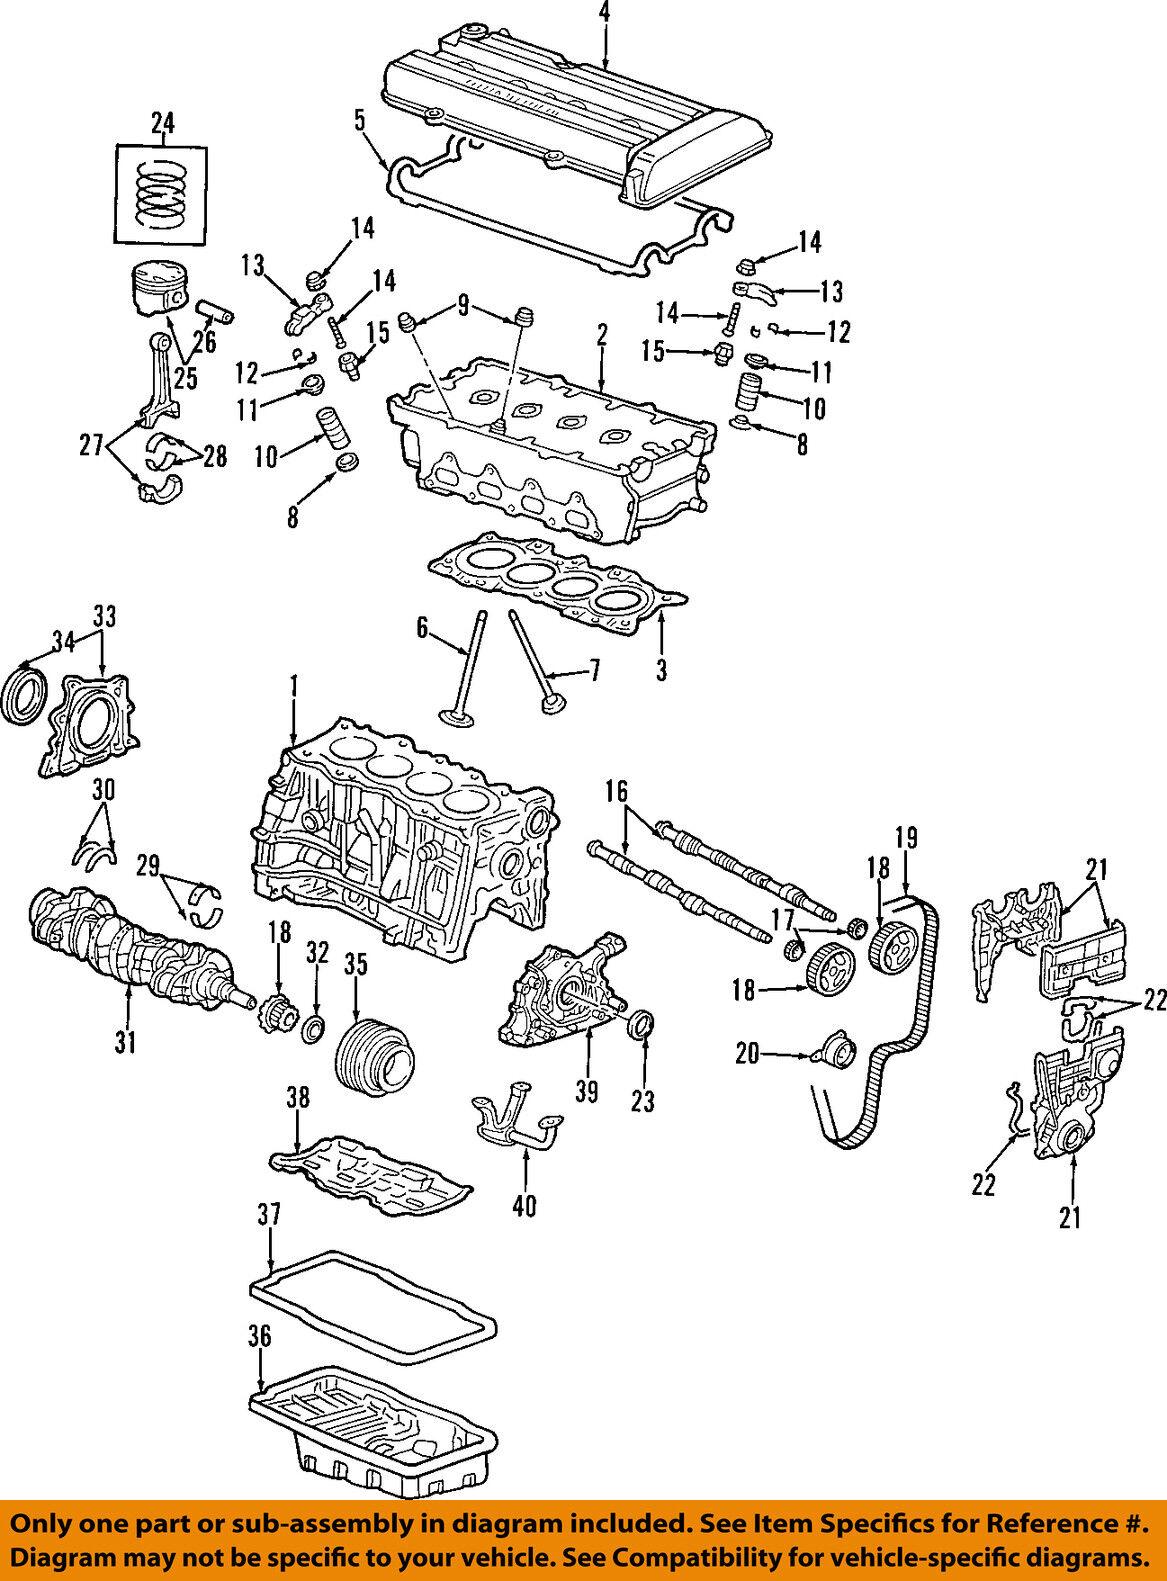 Honda Oem Engine Valve Spring Seat 14775pr4a00 Ebay Gsr Diagram Norton Secured Powered By Verisign